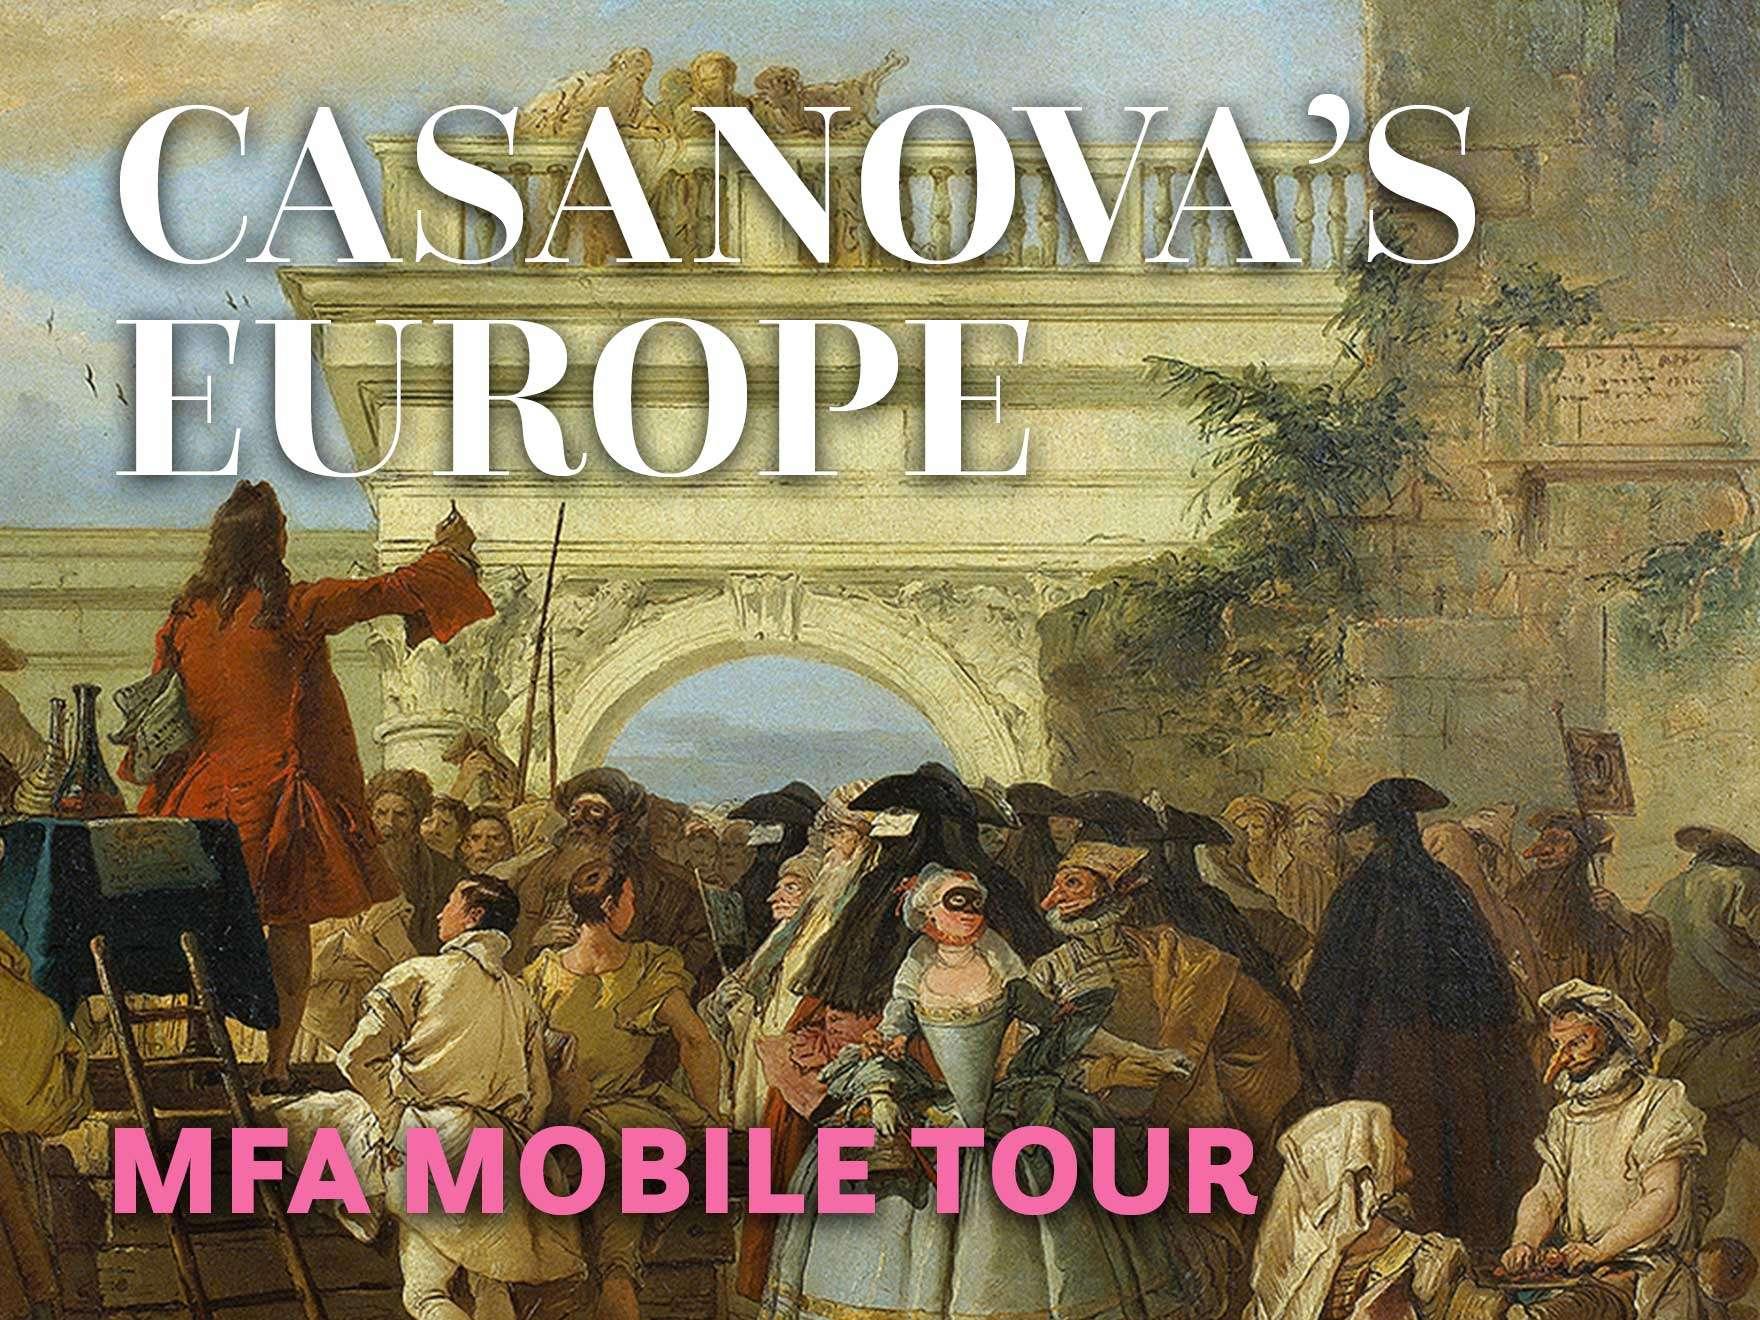 Casanova's Europe: MFA Mobile Tour